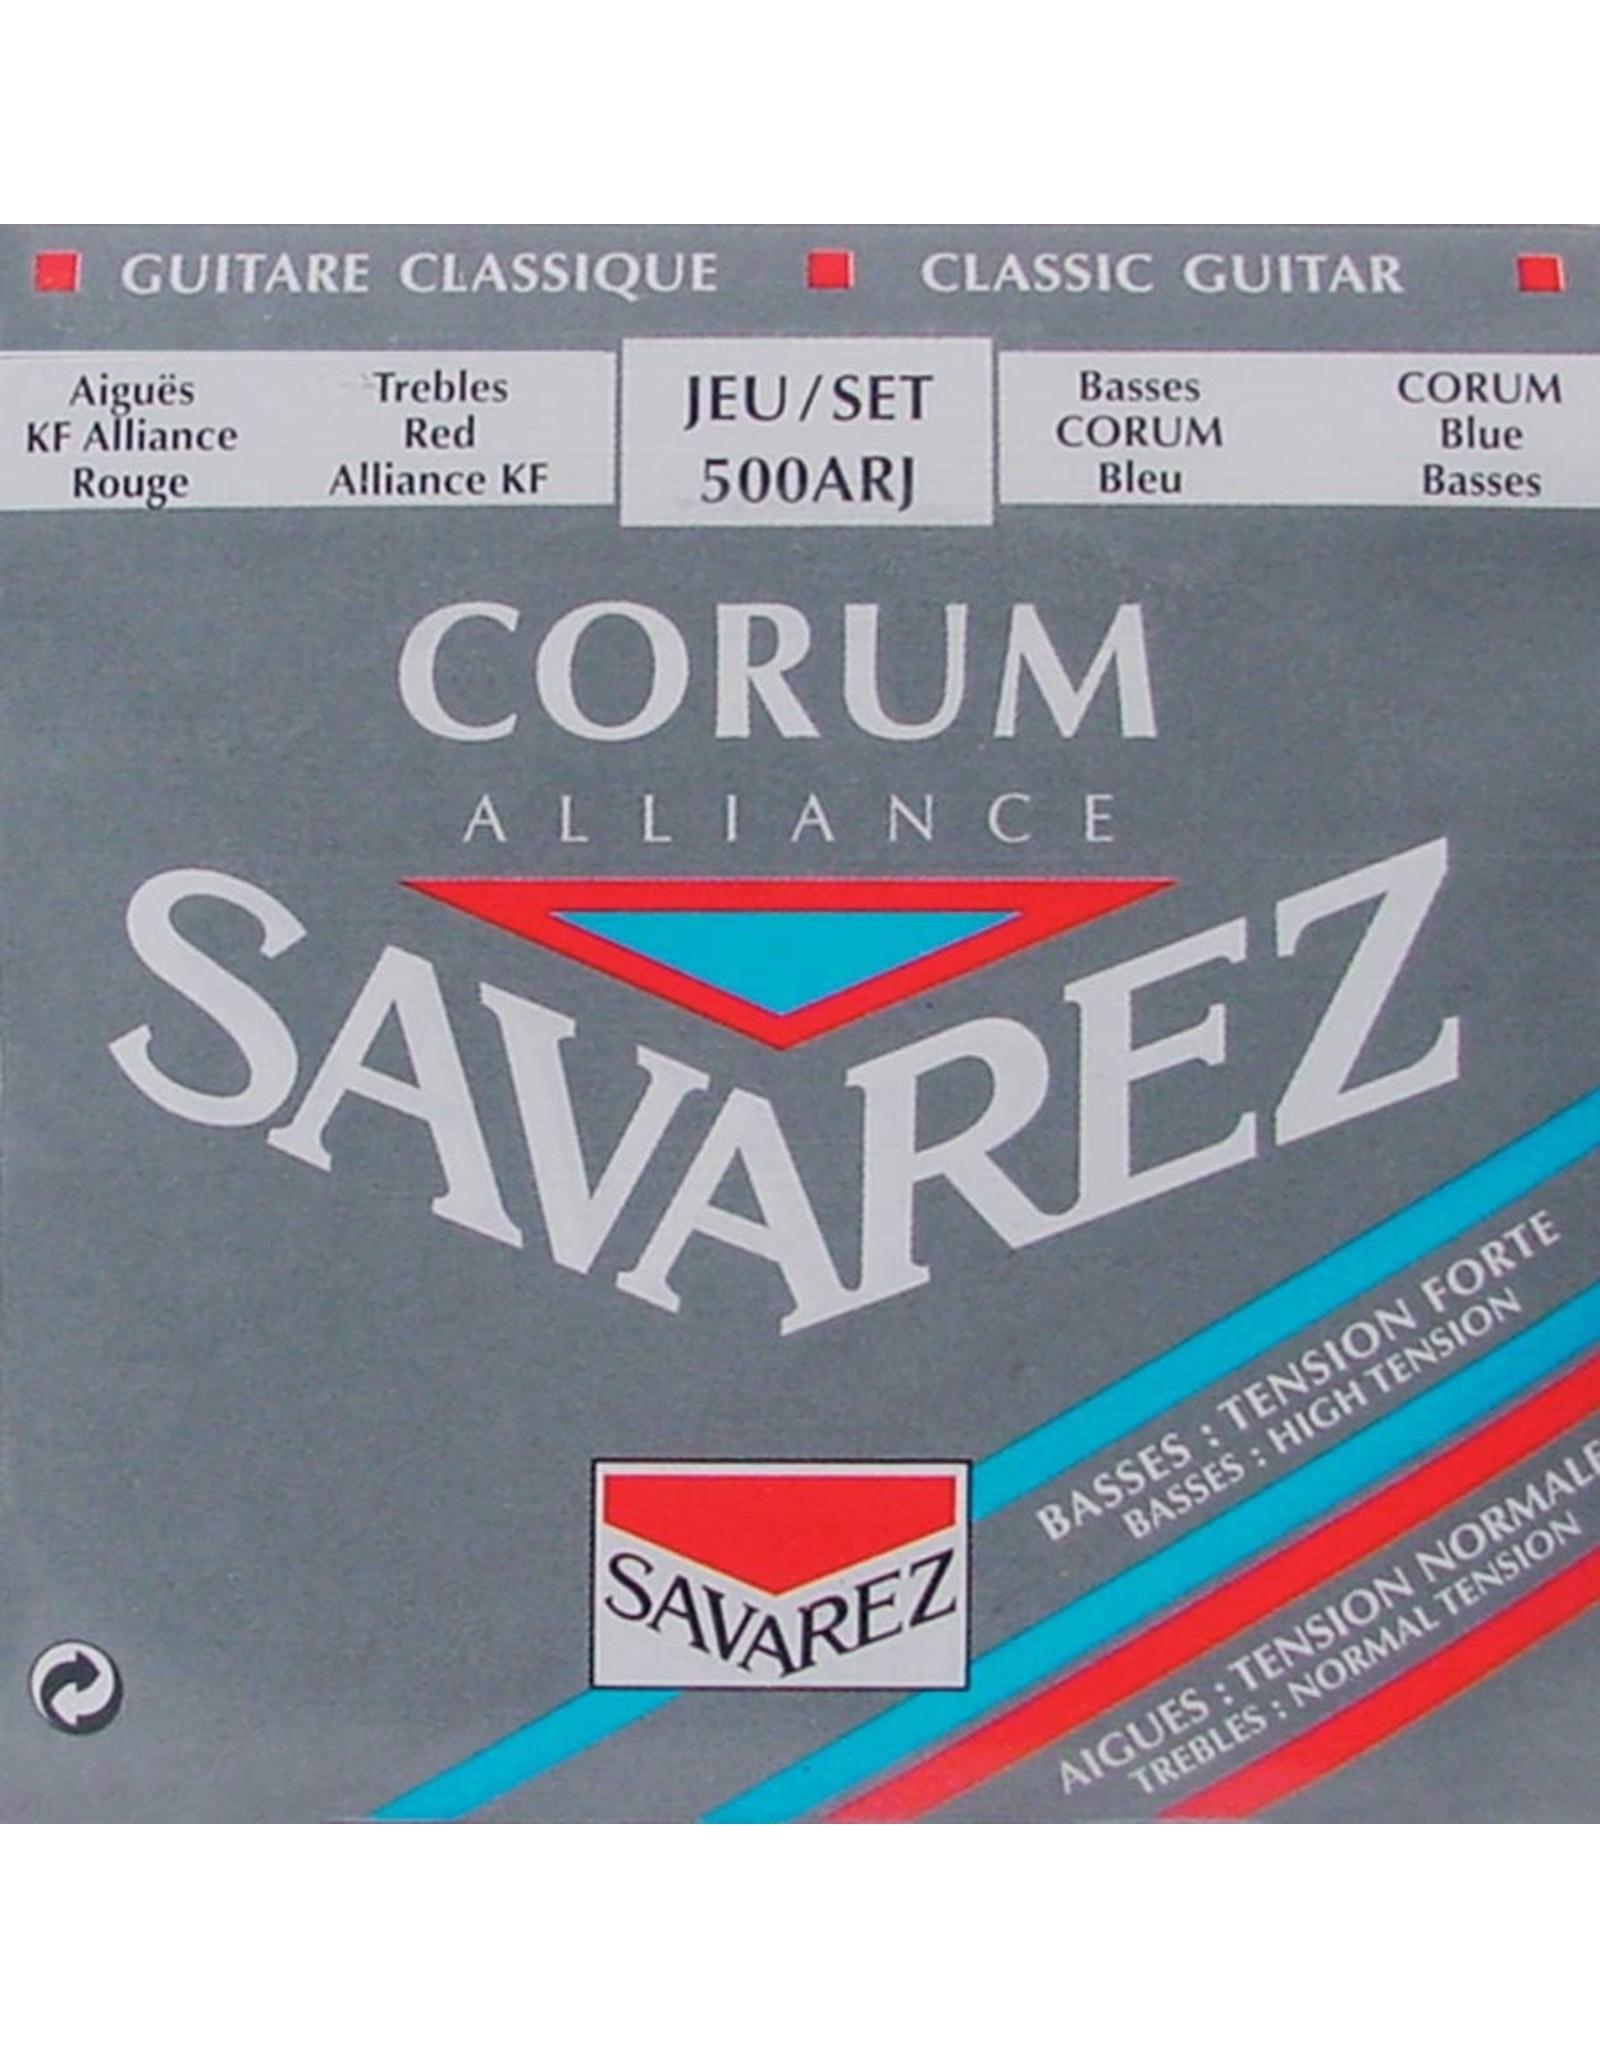 Savarez Savarez Corum Alliance 500-ARJ Hybrid tension